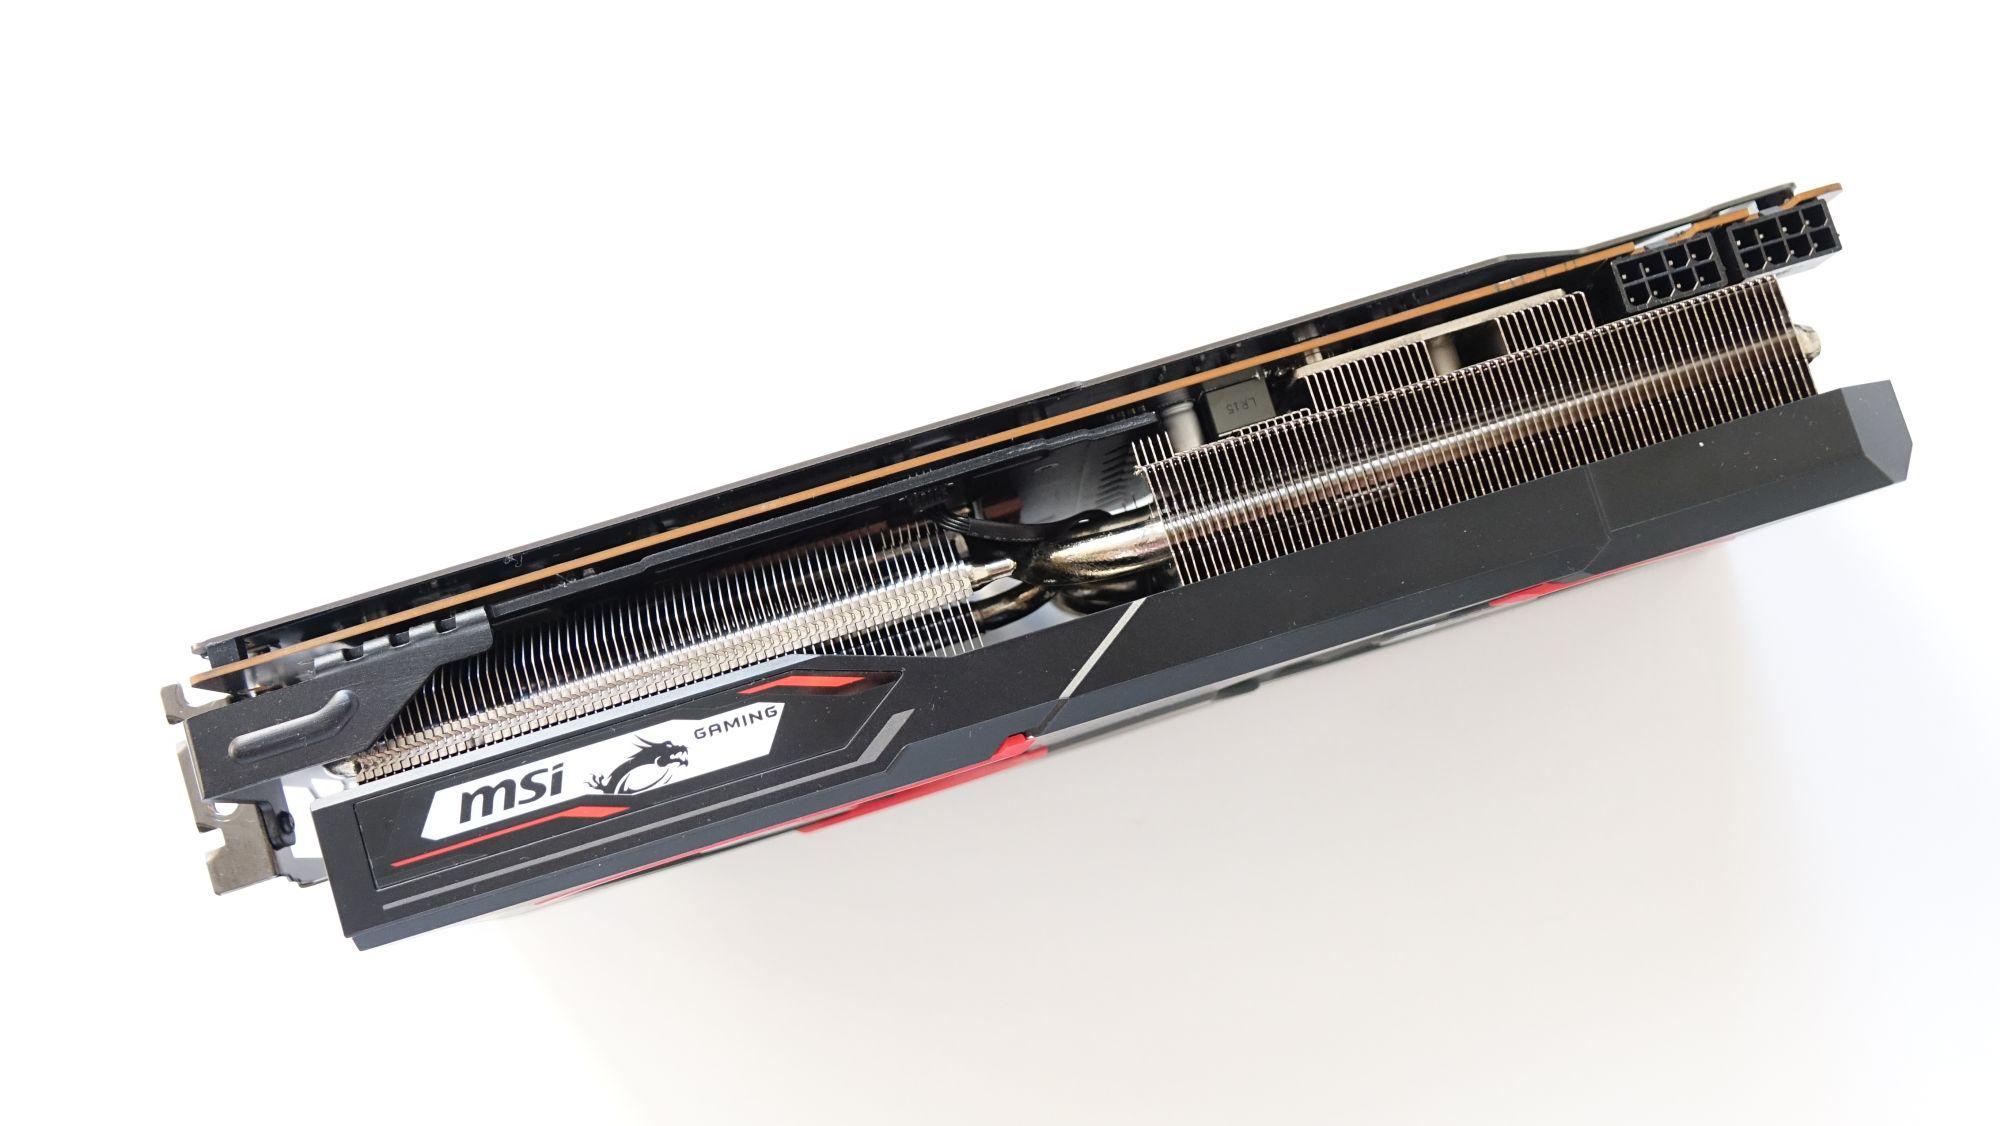 MSI Radeon RX 5700 XT Gaming X радиатор